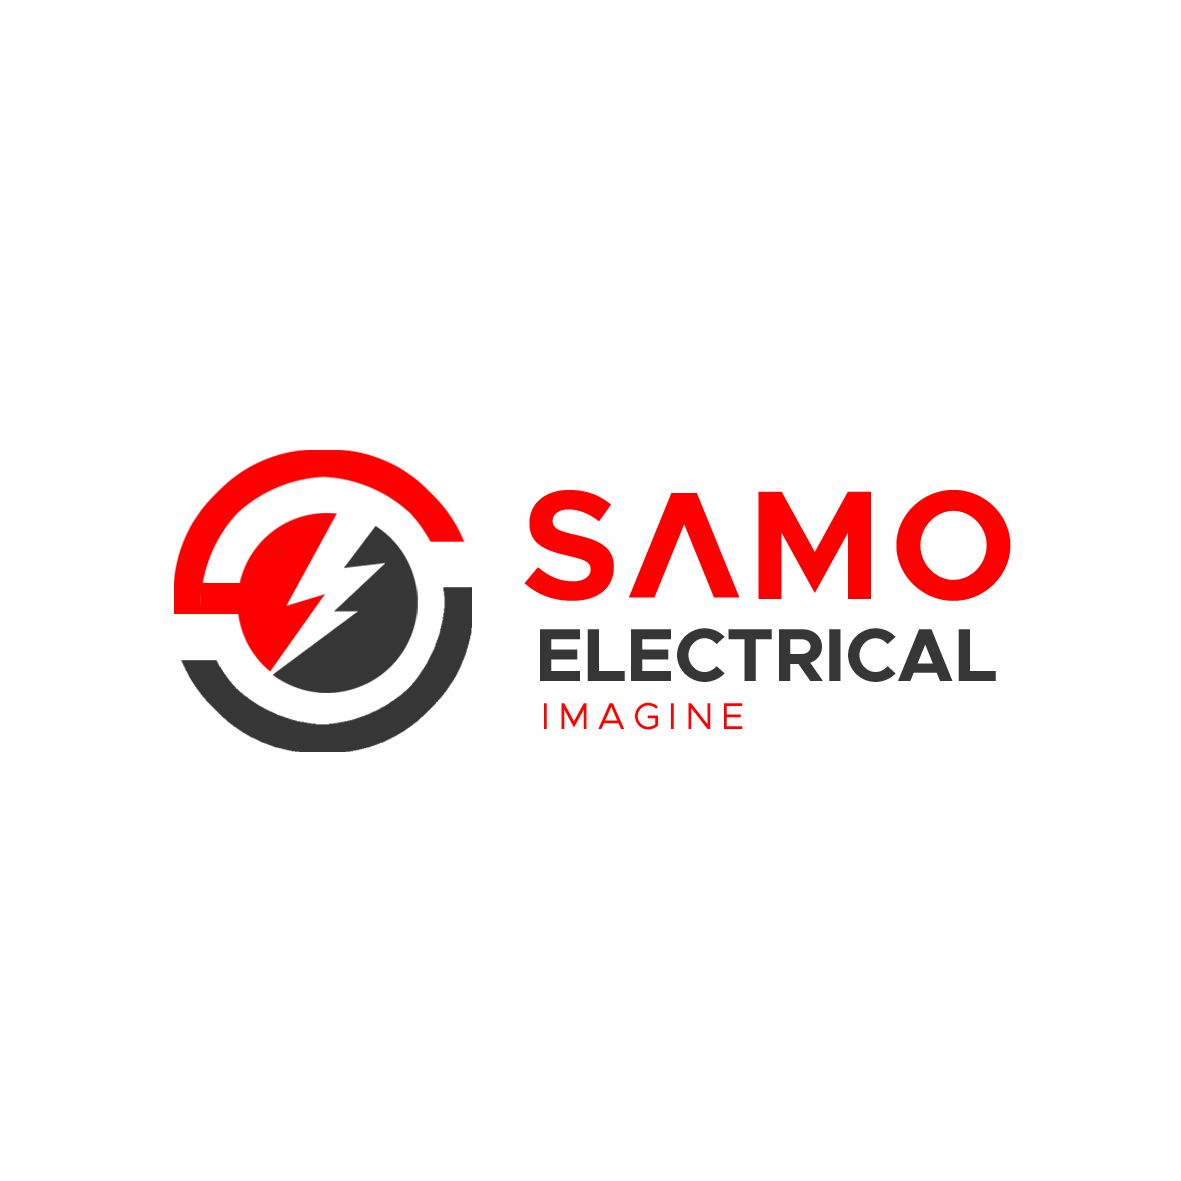 SAMO ELECTRICAL